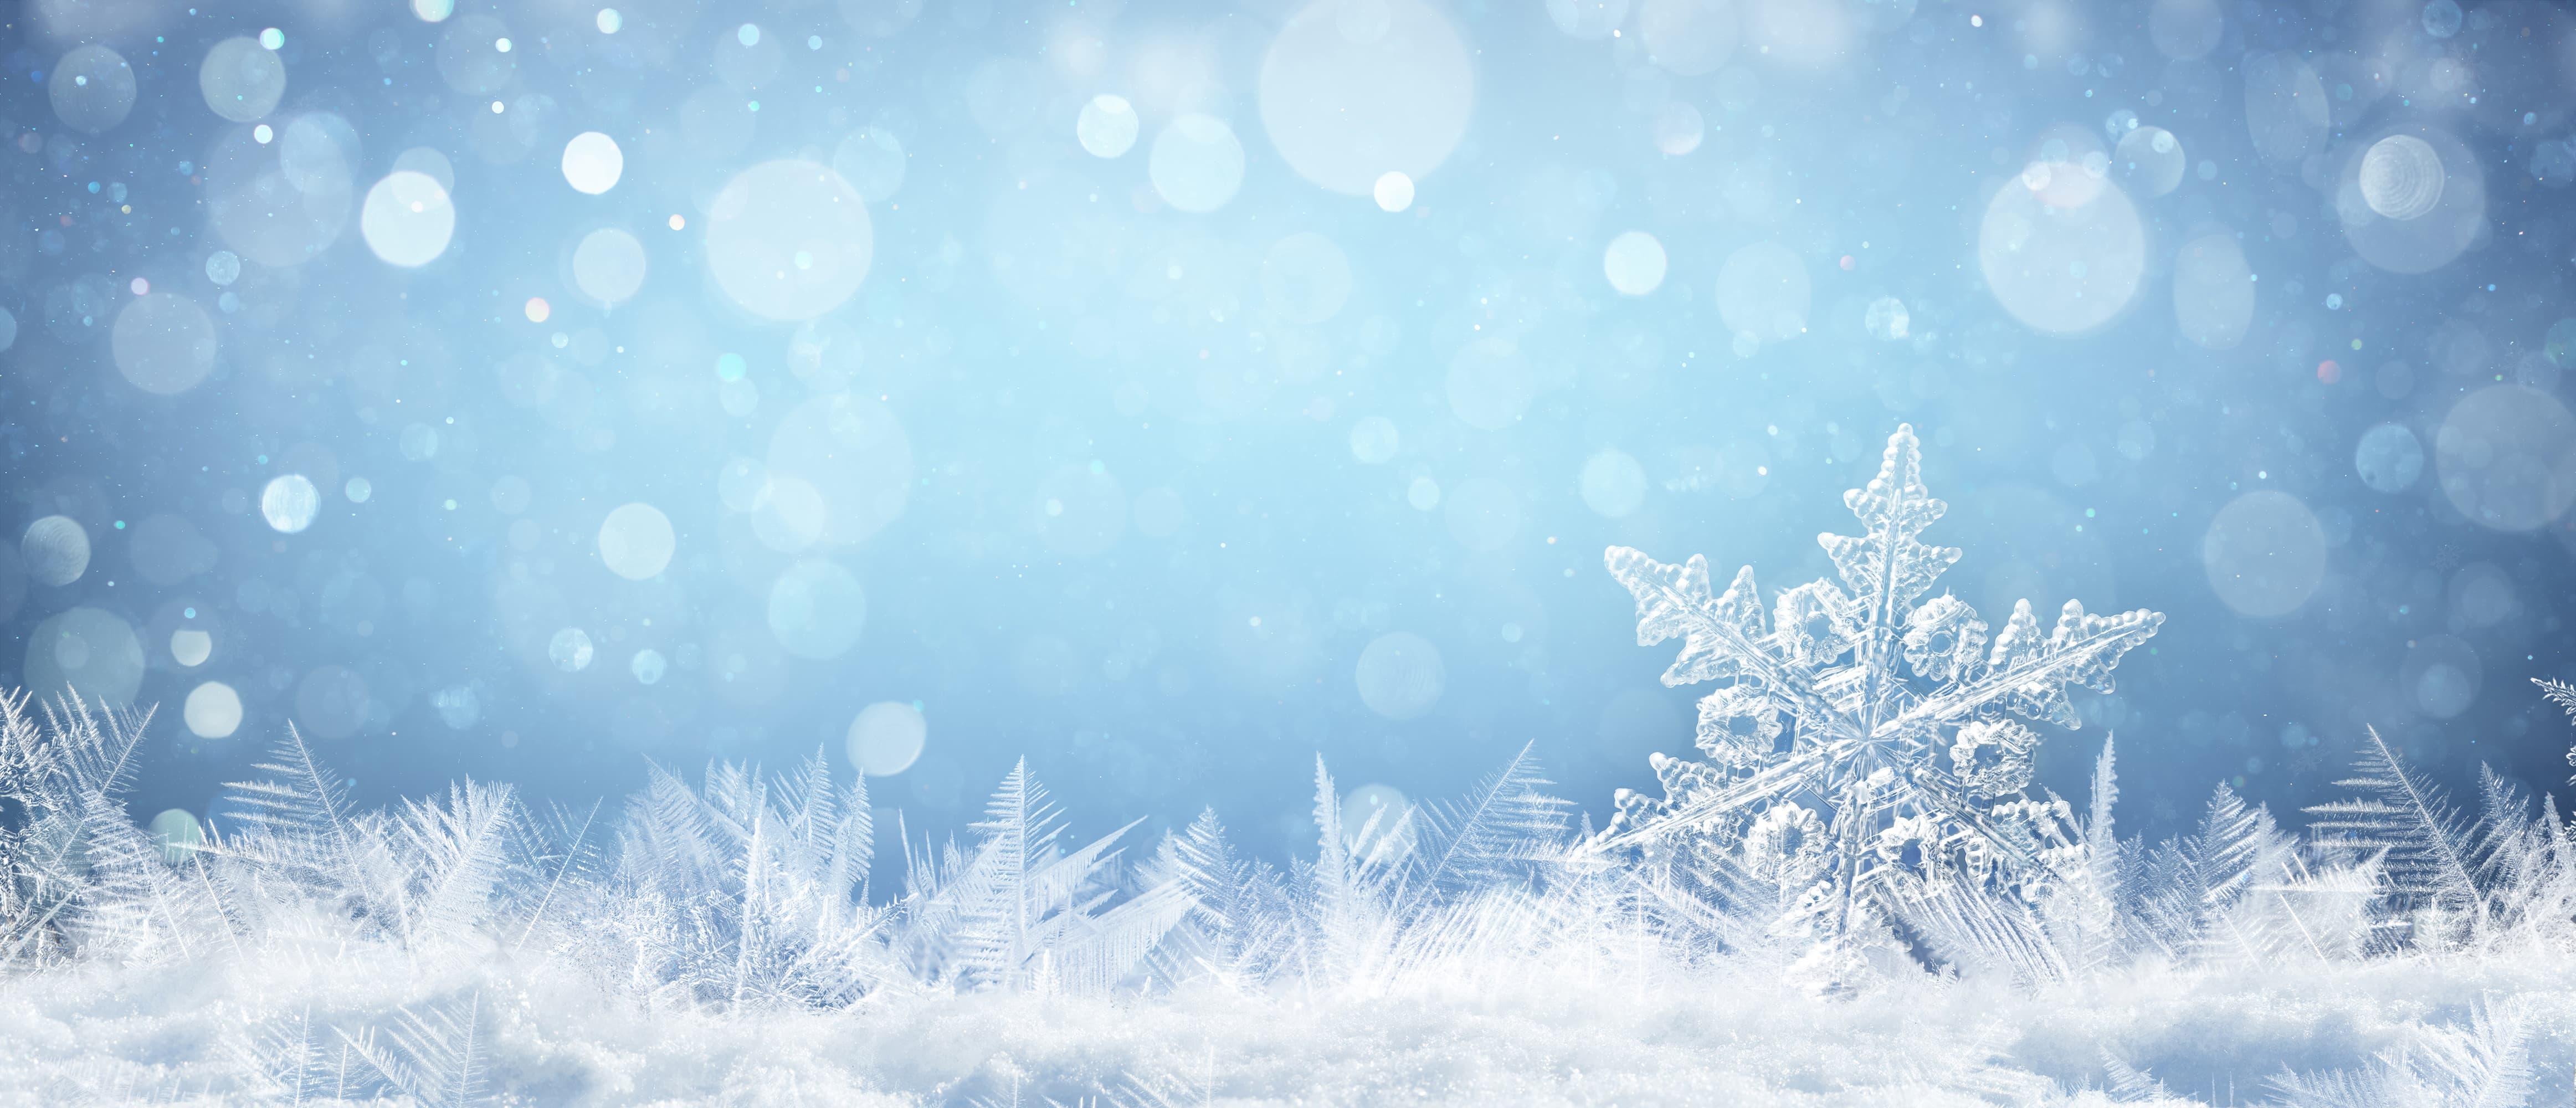 Ferieaktiviteter for hele familien i vinterferien